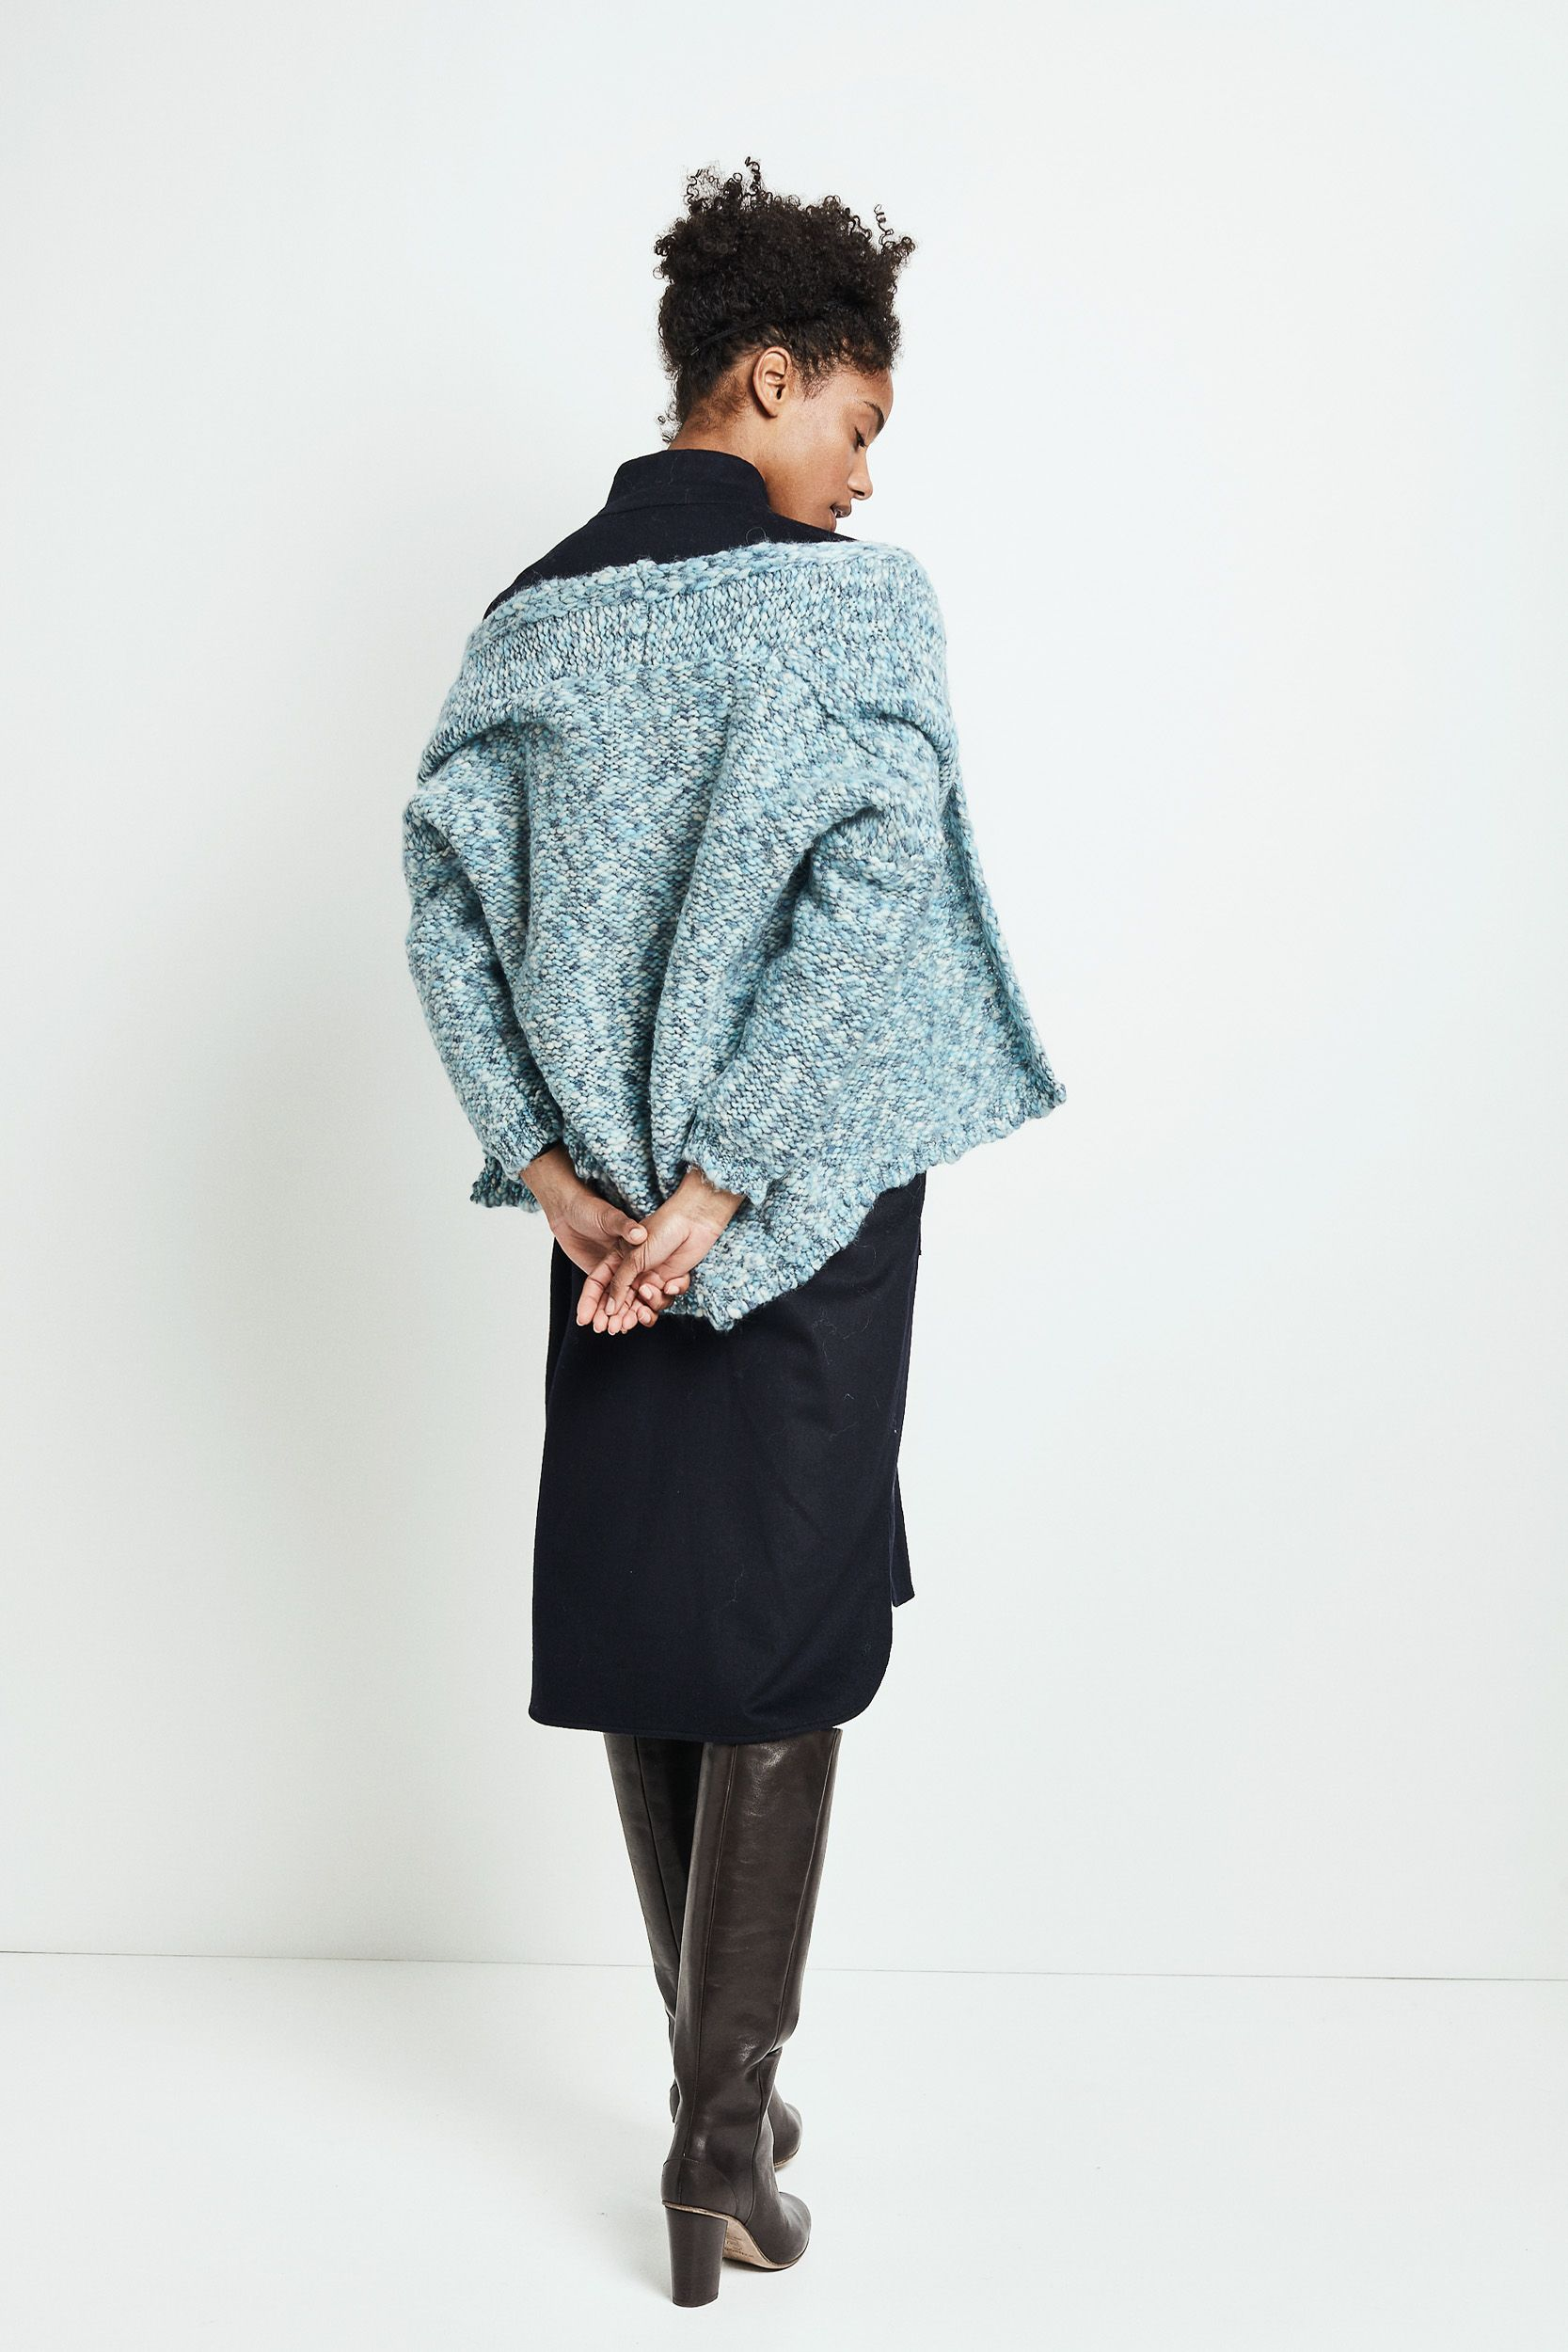 Humanoid aw18 collection outerwear women fashion